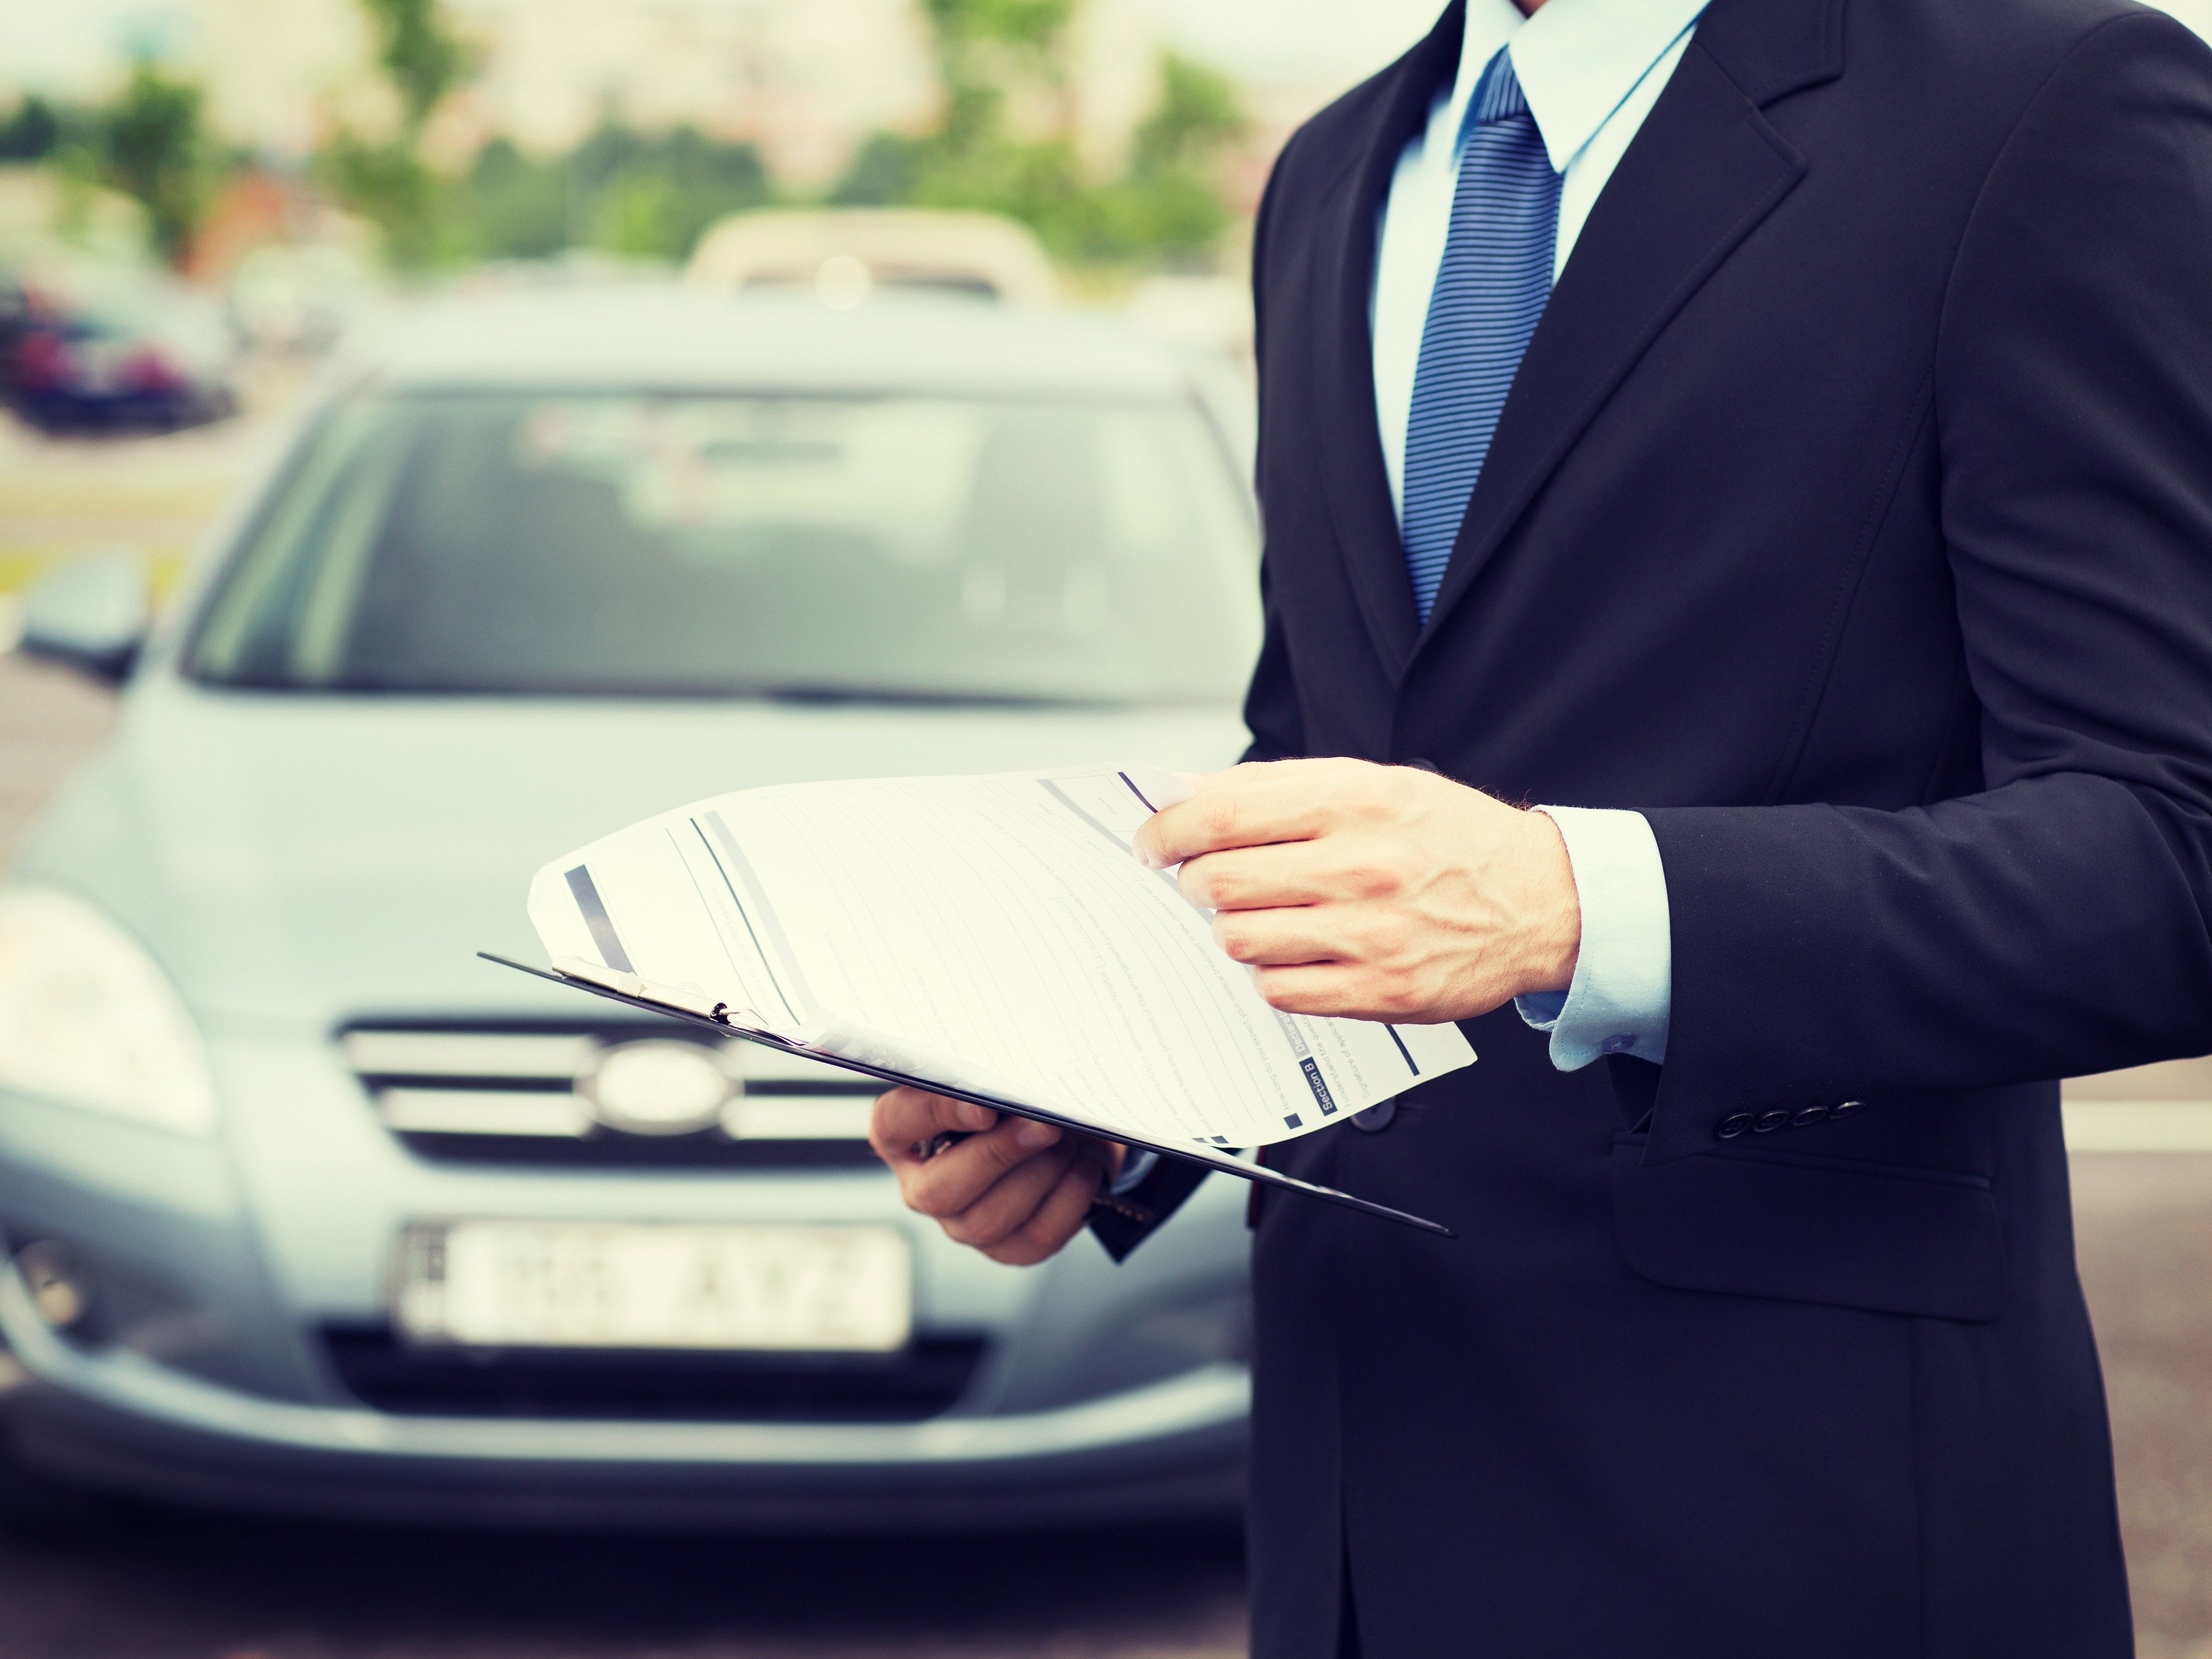 leasing cars vs buying